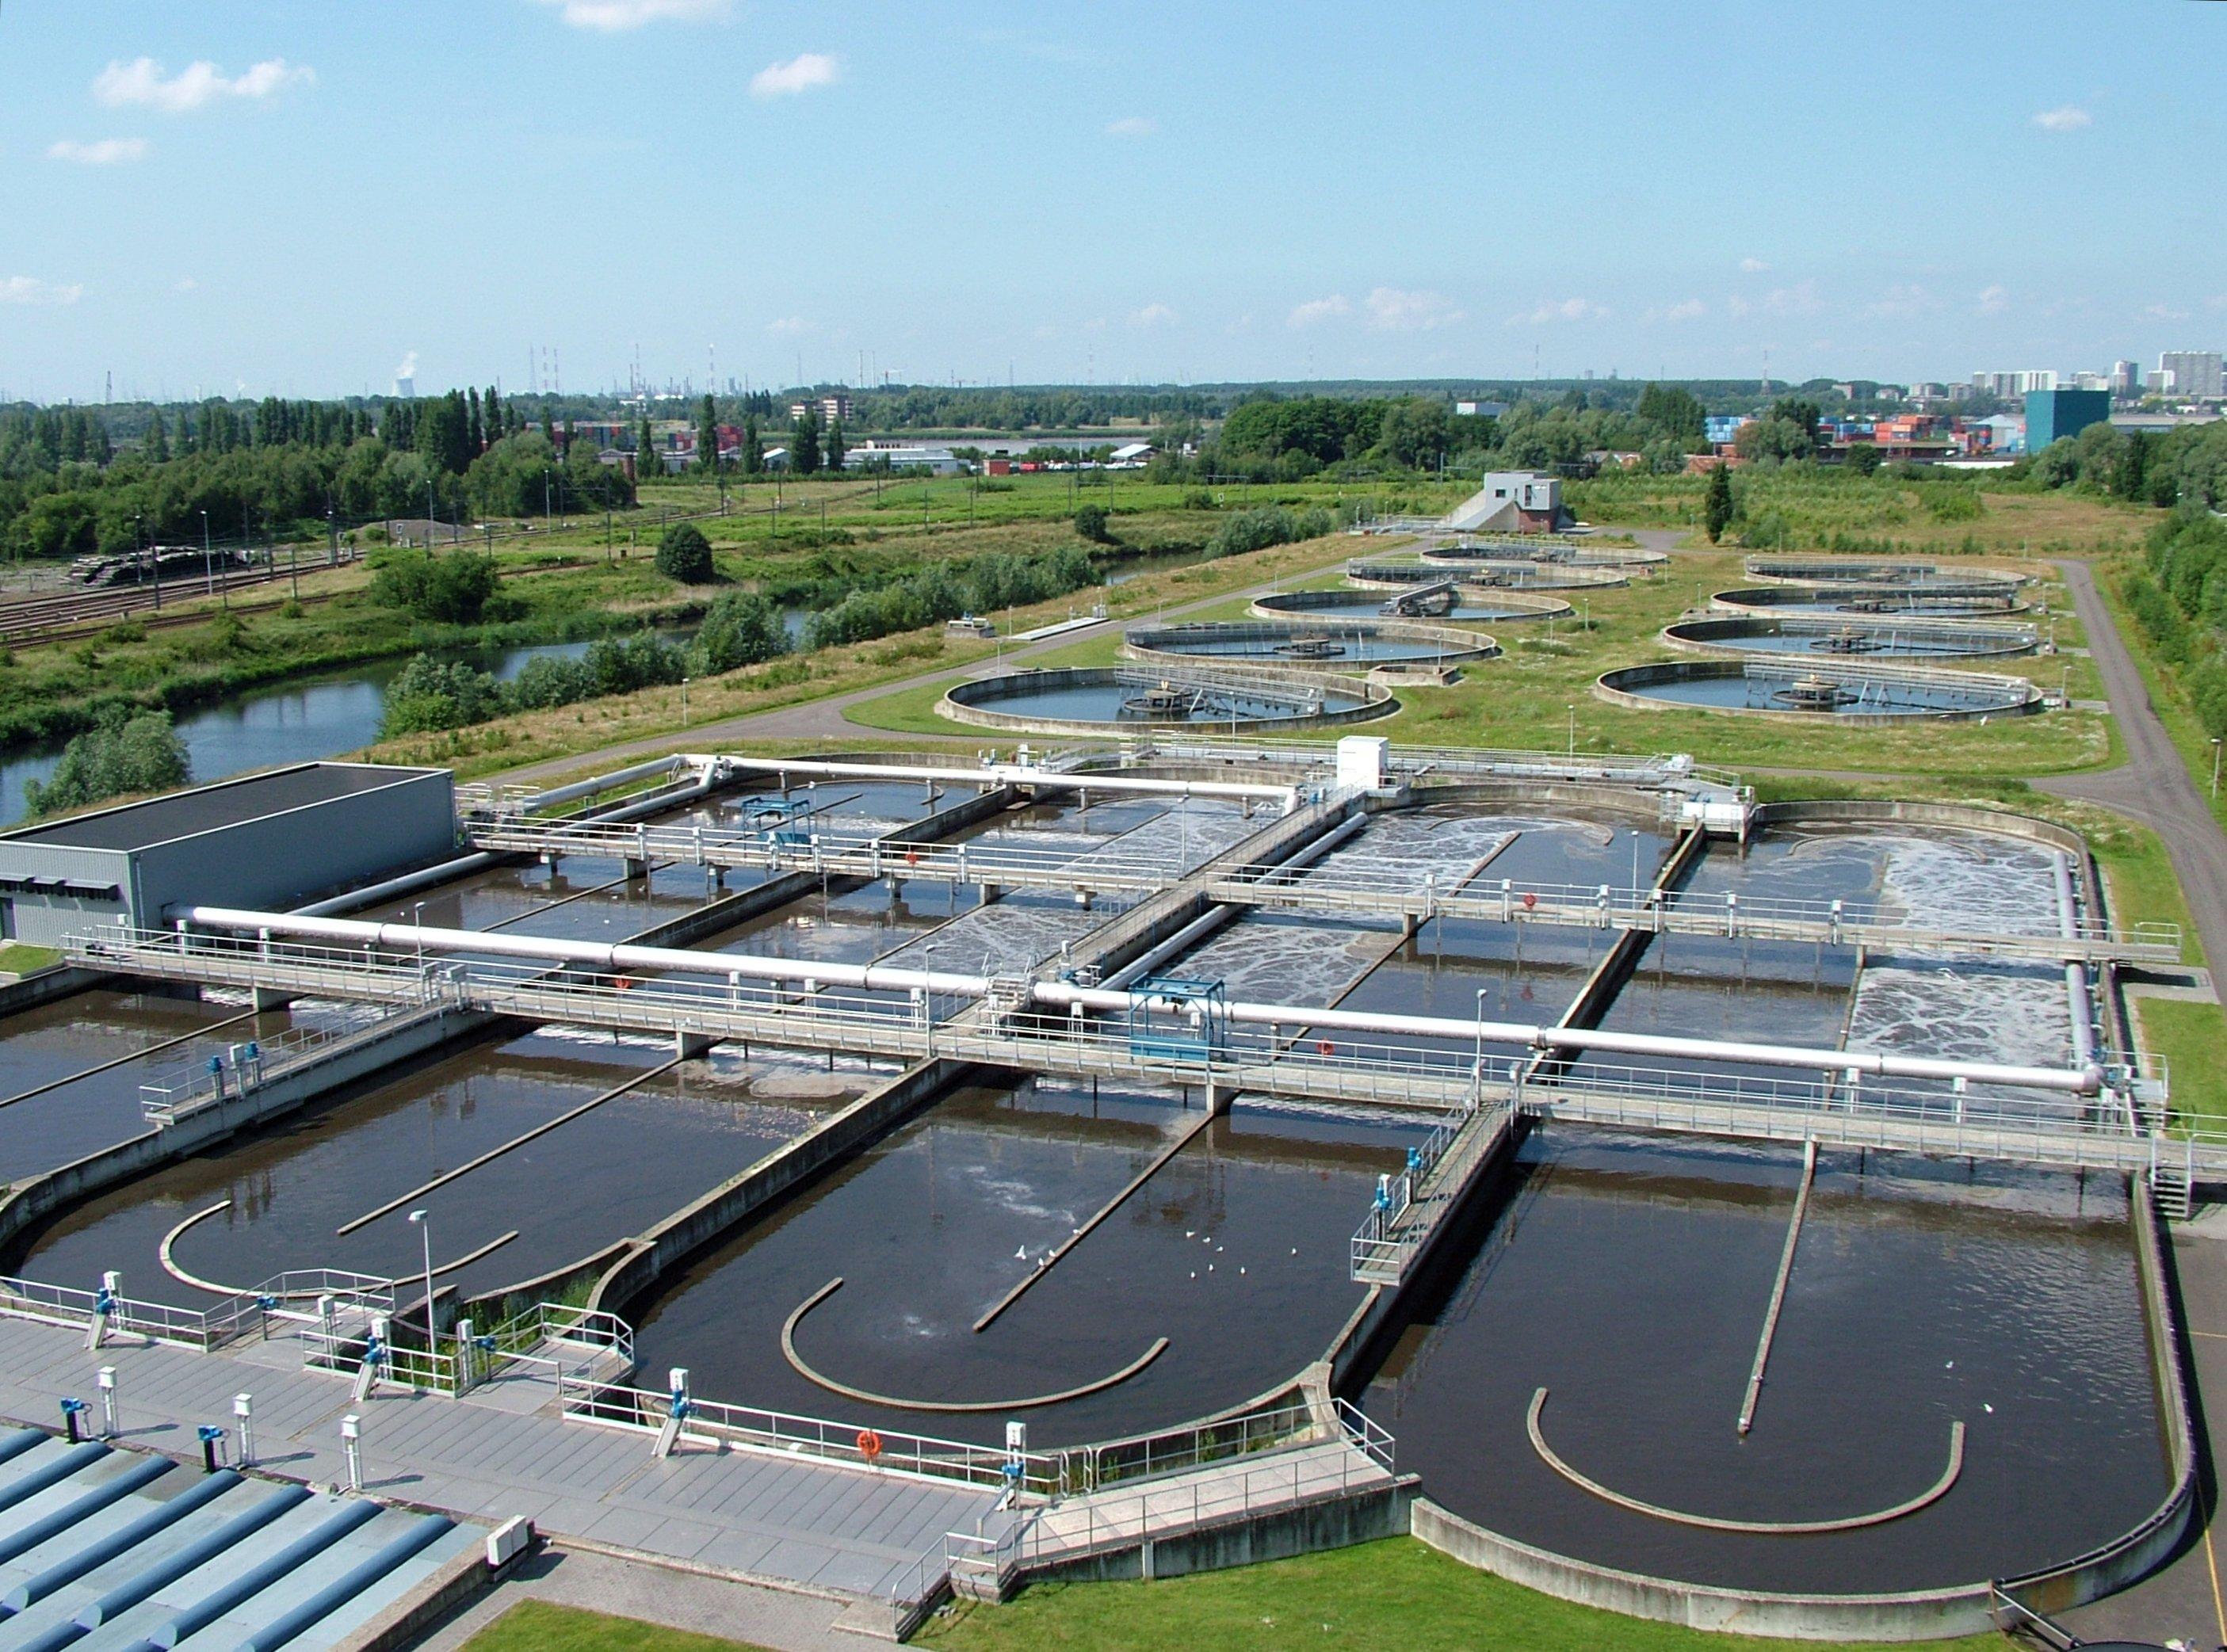 tratamiento-de-agua-potable-e-industrial1